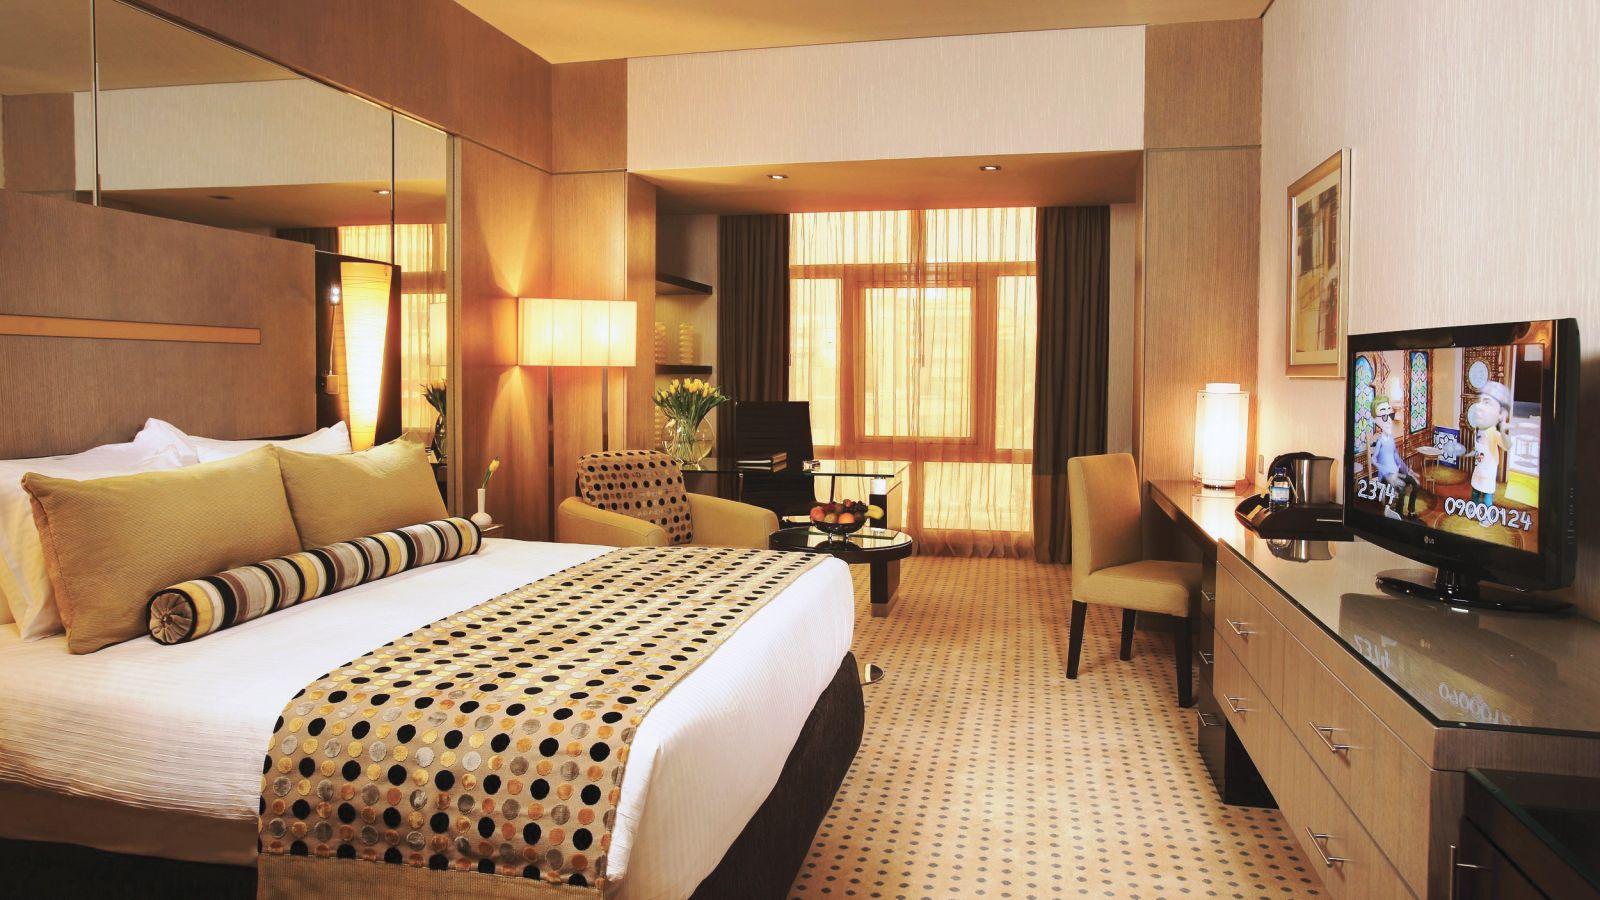 United Arab Emirates Hotels   TIME Hotels